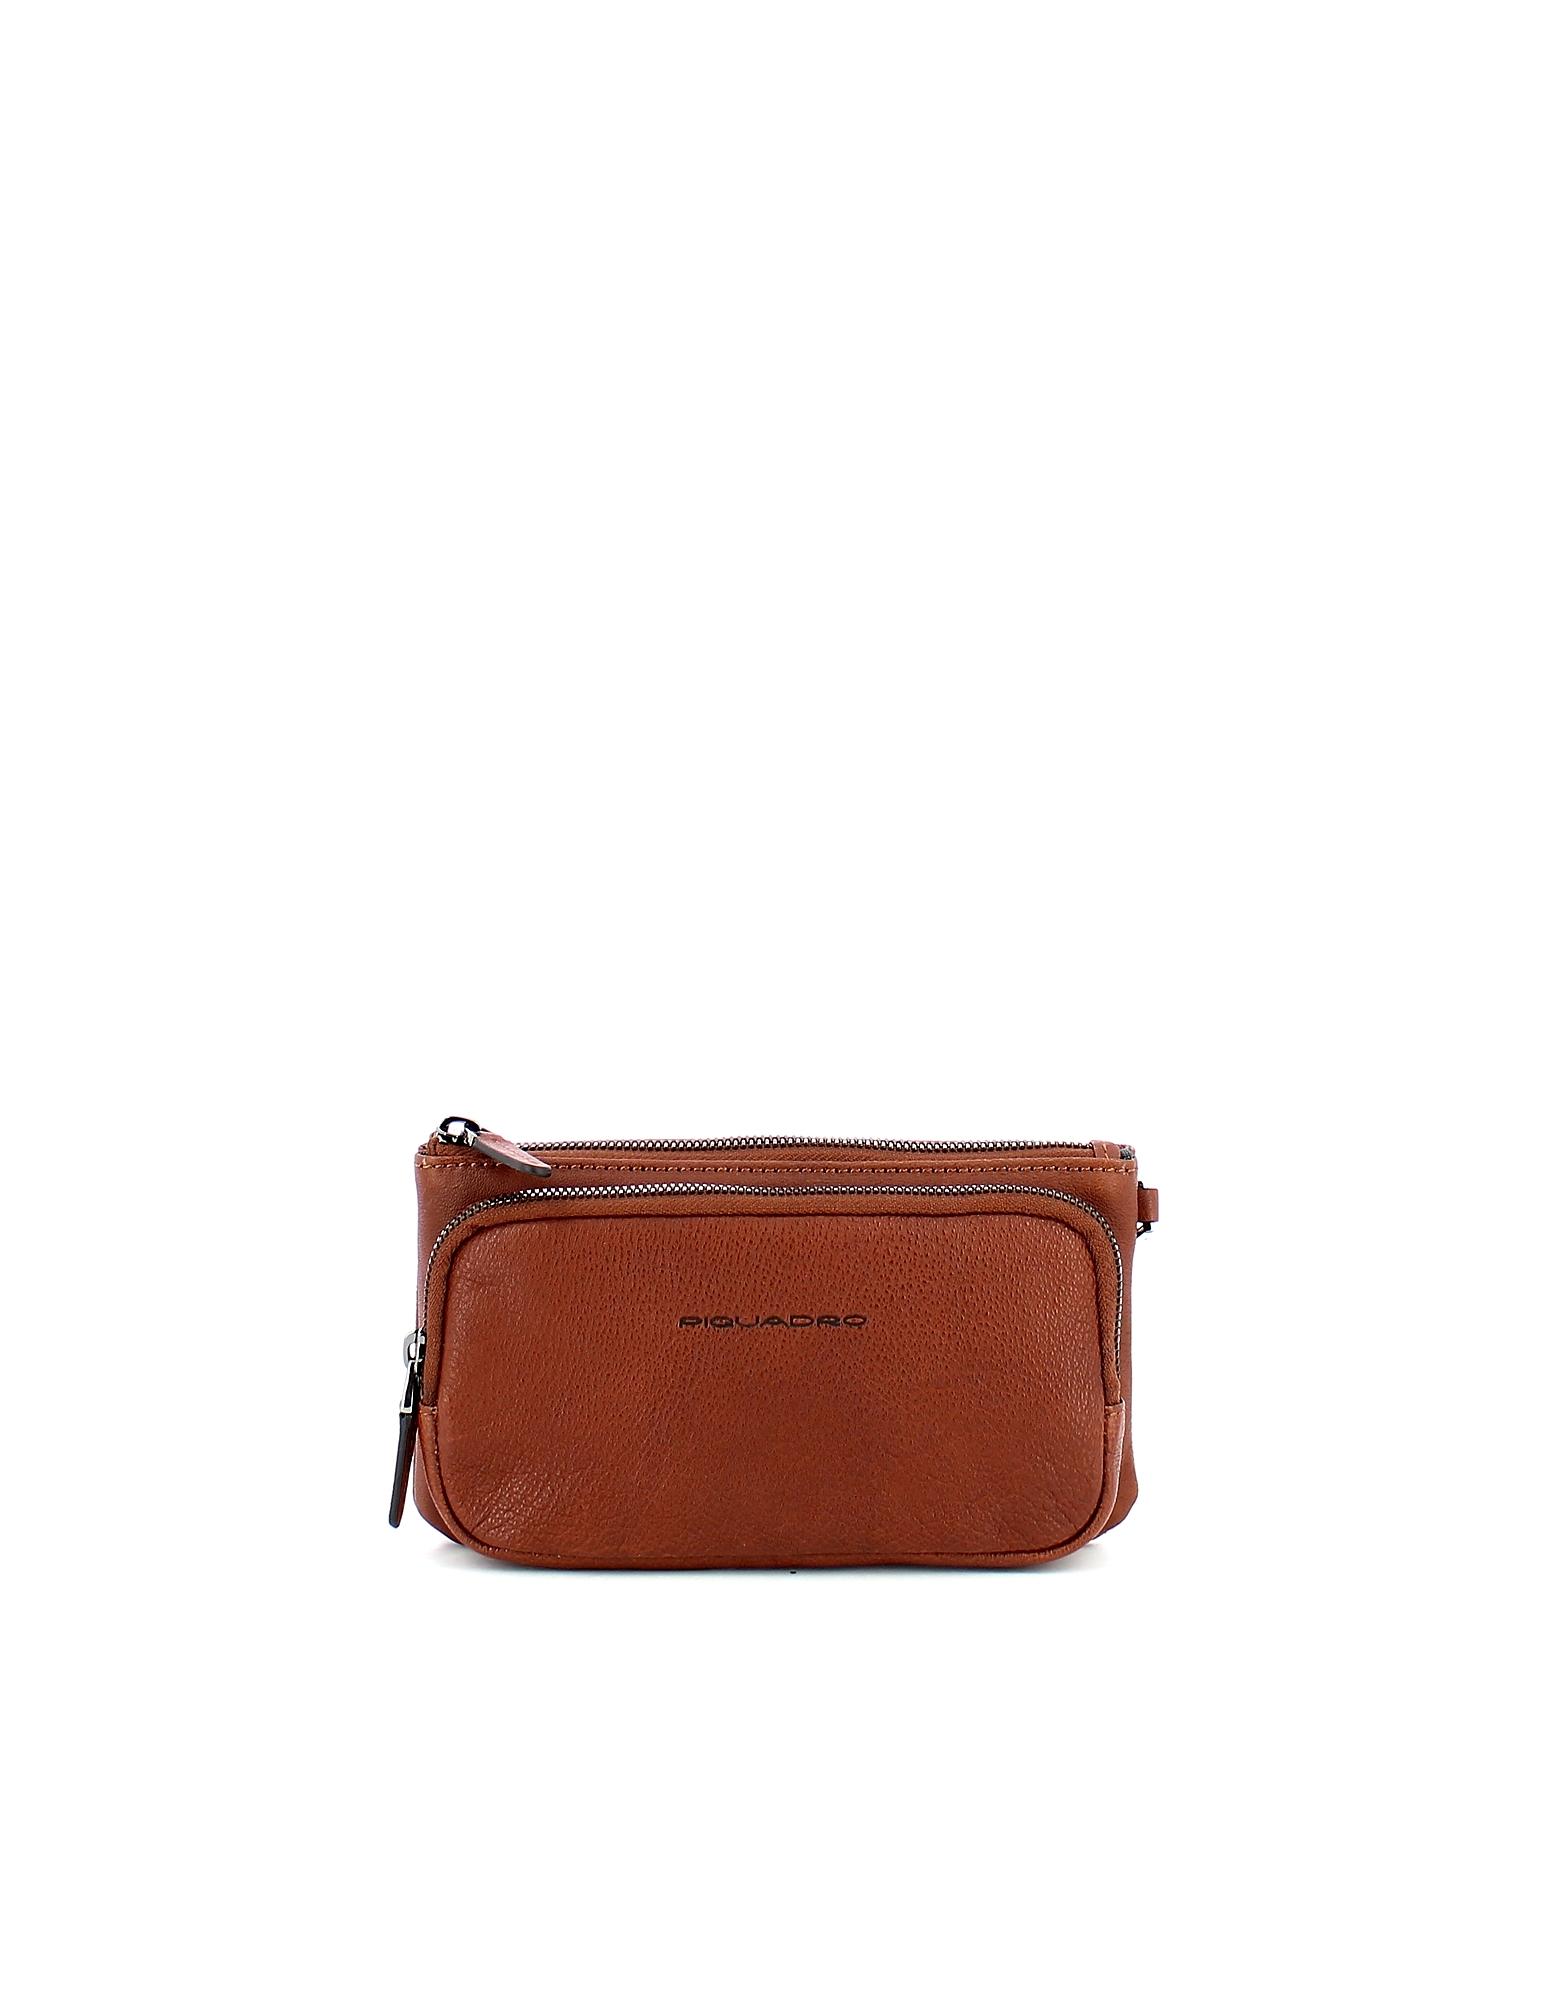 Piquadro Designer Travel Bags, Men's Brown Beauty Case